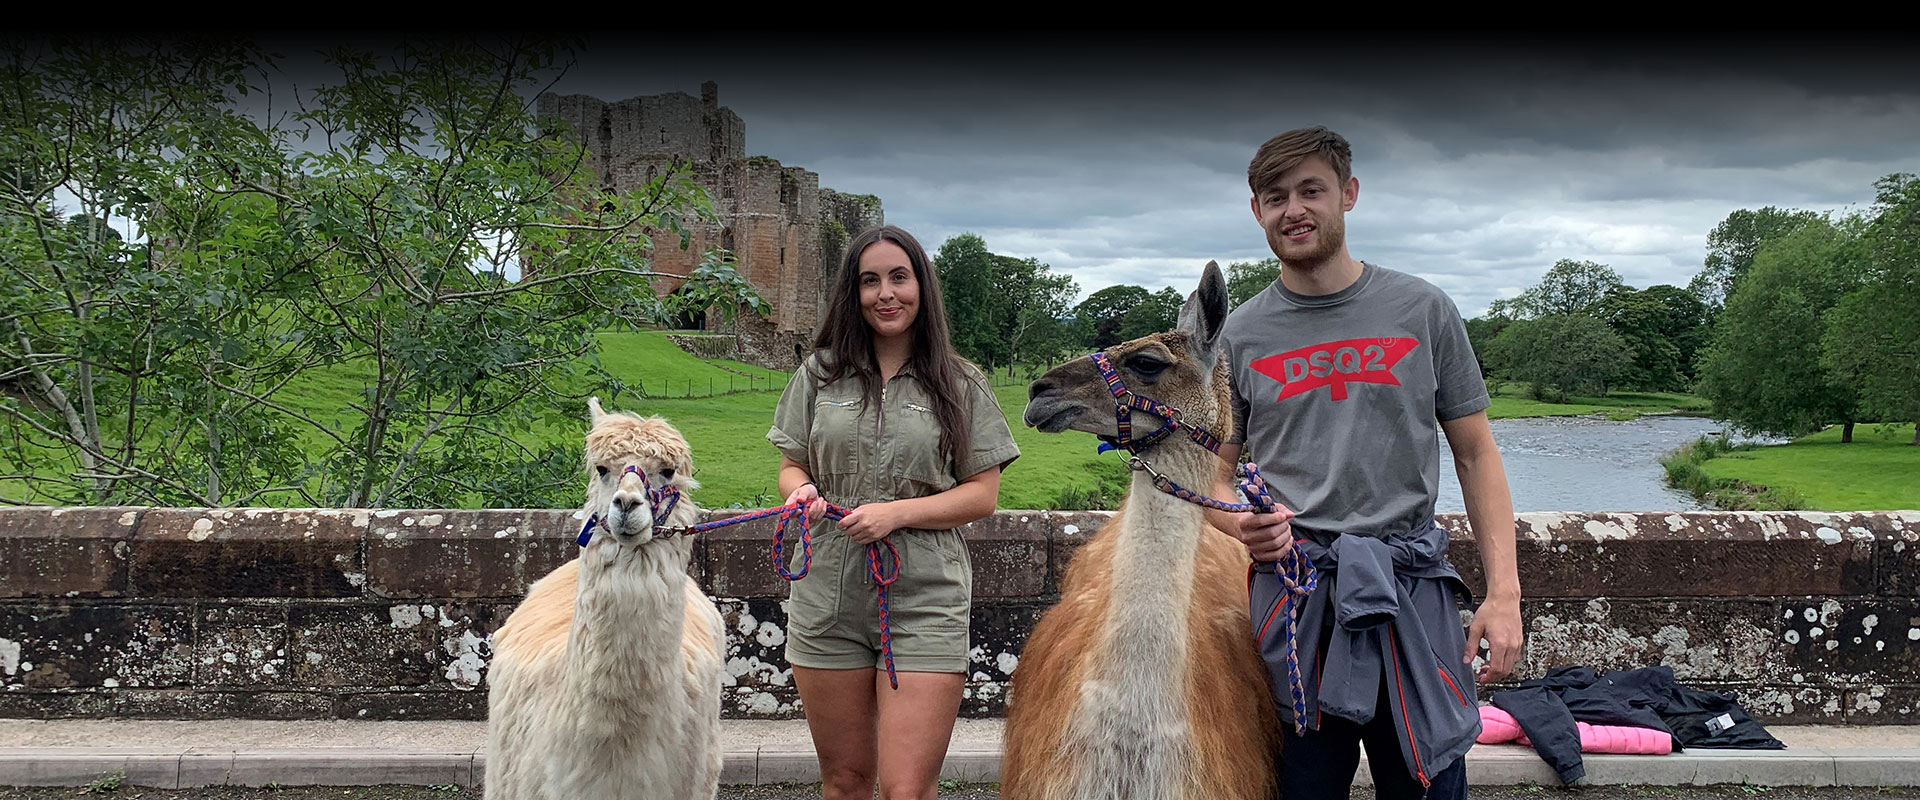 Lakeland Llama Treks & Trekking